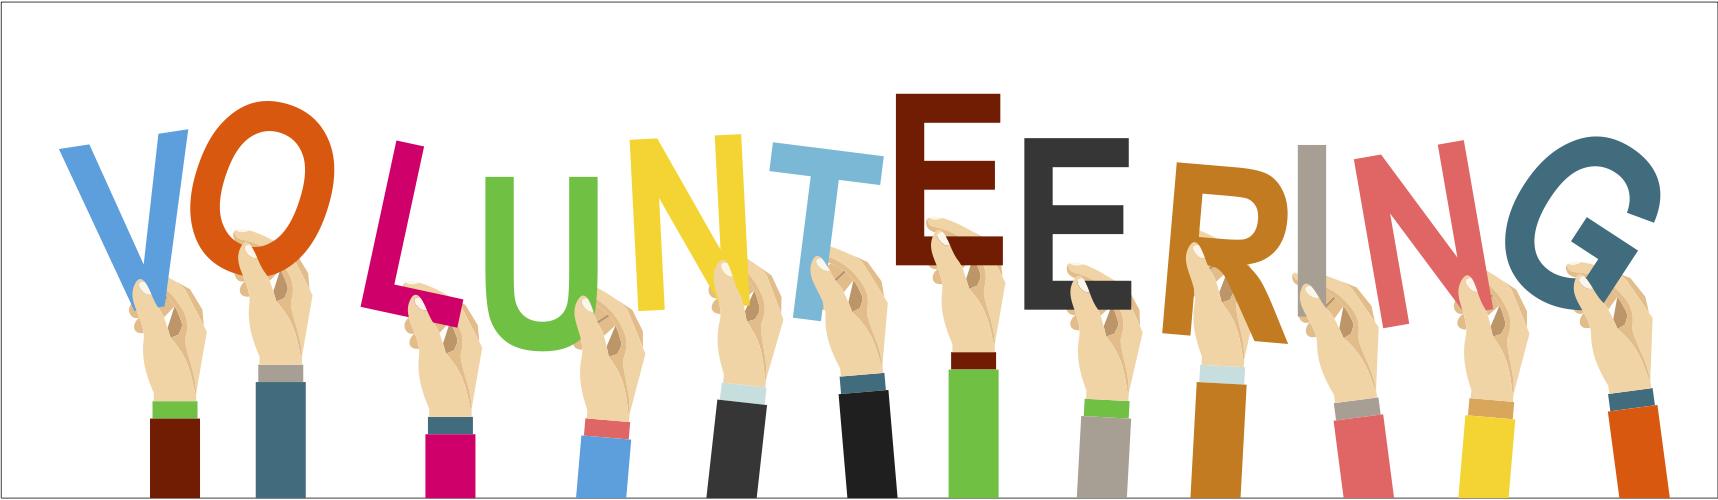 Volunteering horizonal logo